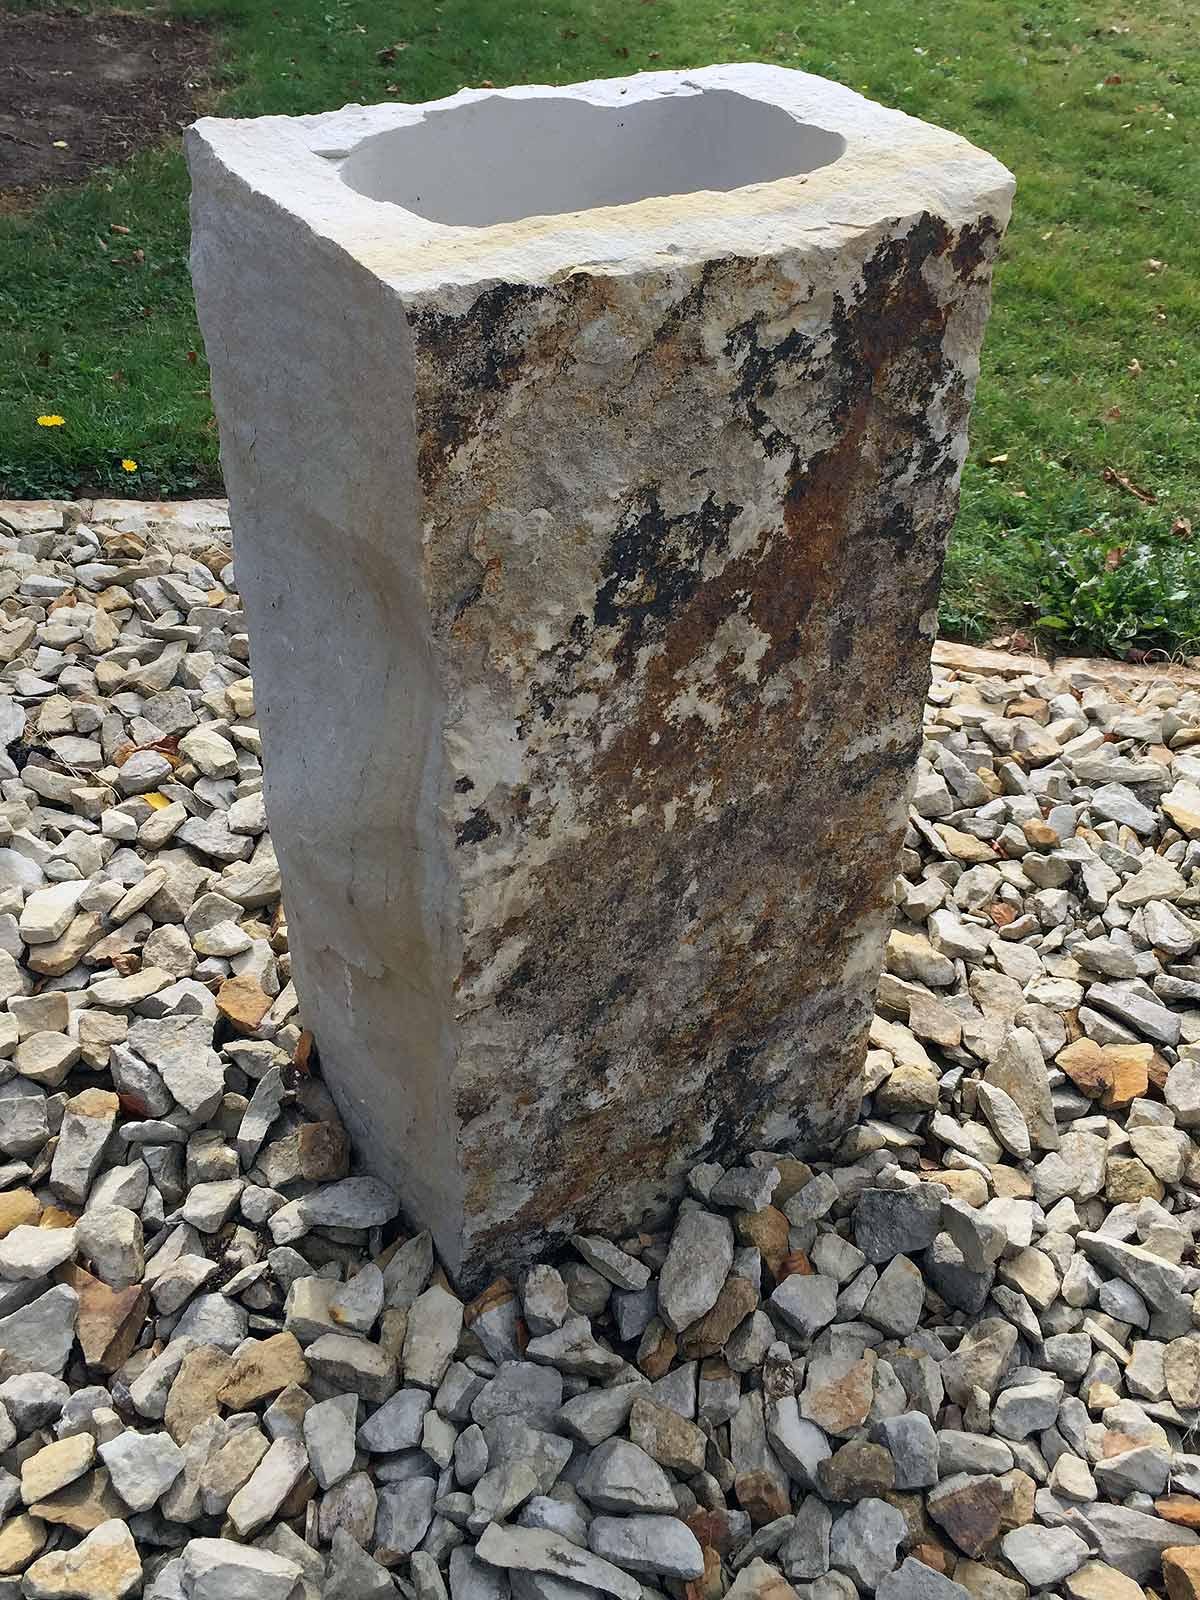 Blumenkübel blumenkübel obernkirchener sandstein